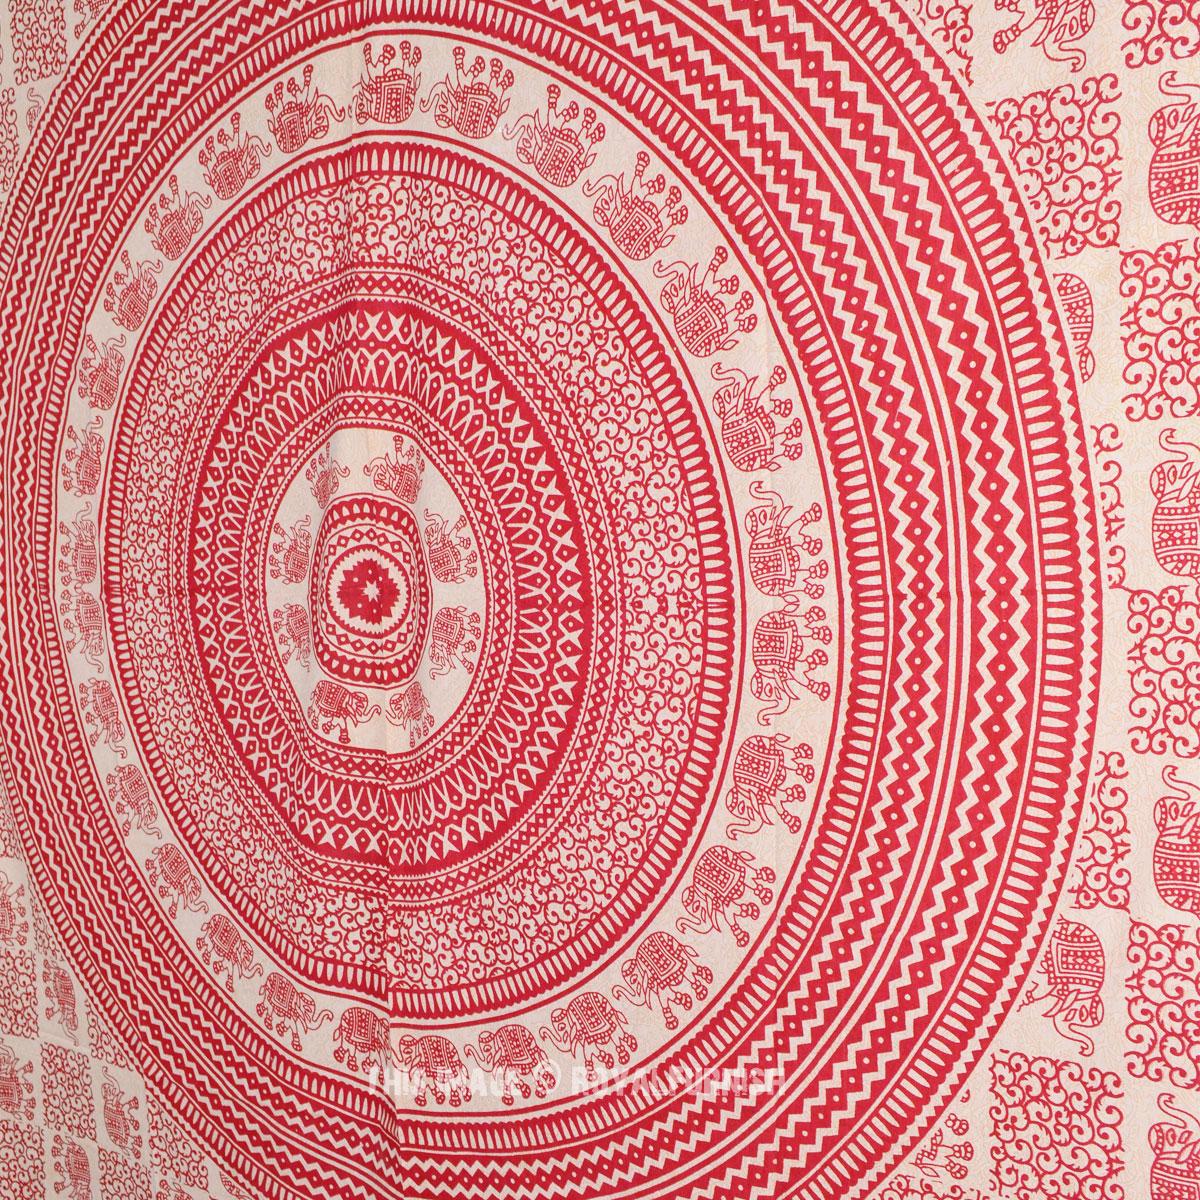 Red Elephant Hippie Mandala Tapestry Wall Hanging Dorm Decor Bedcover Home Decor Ebay